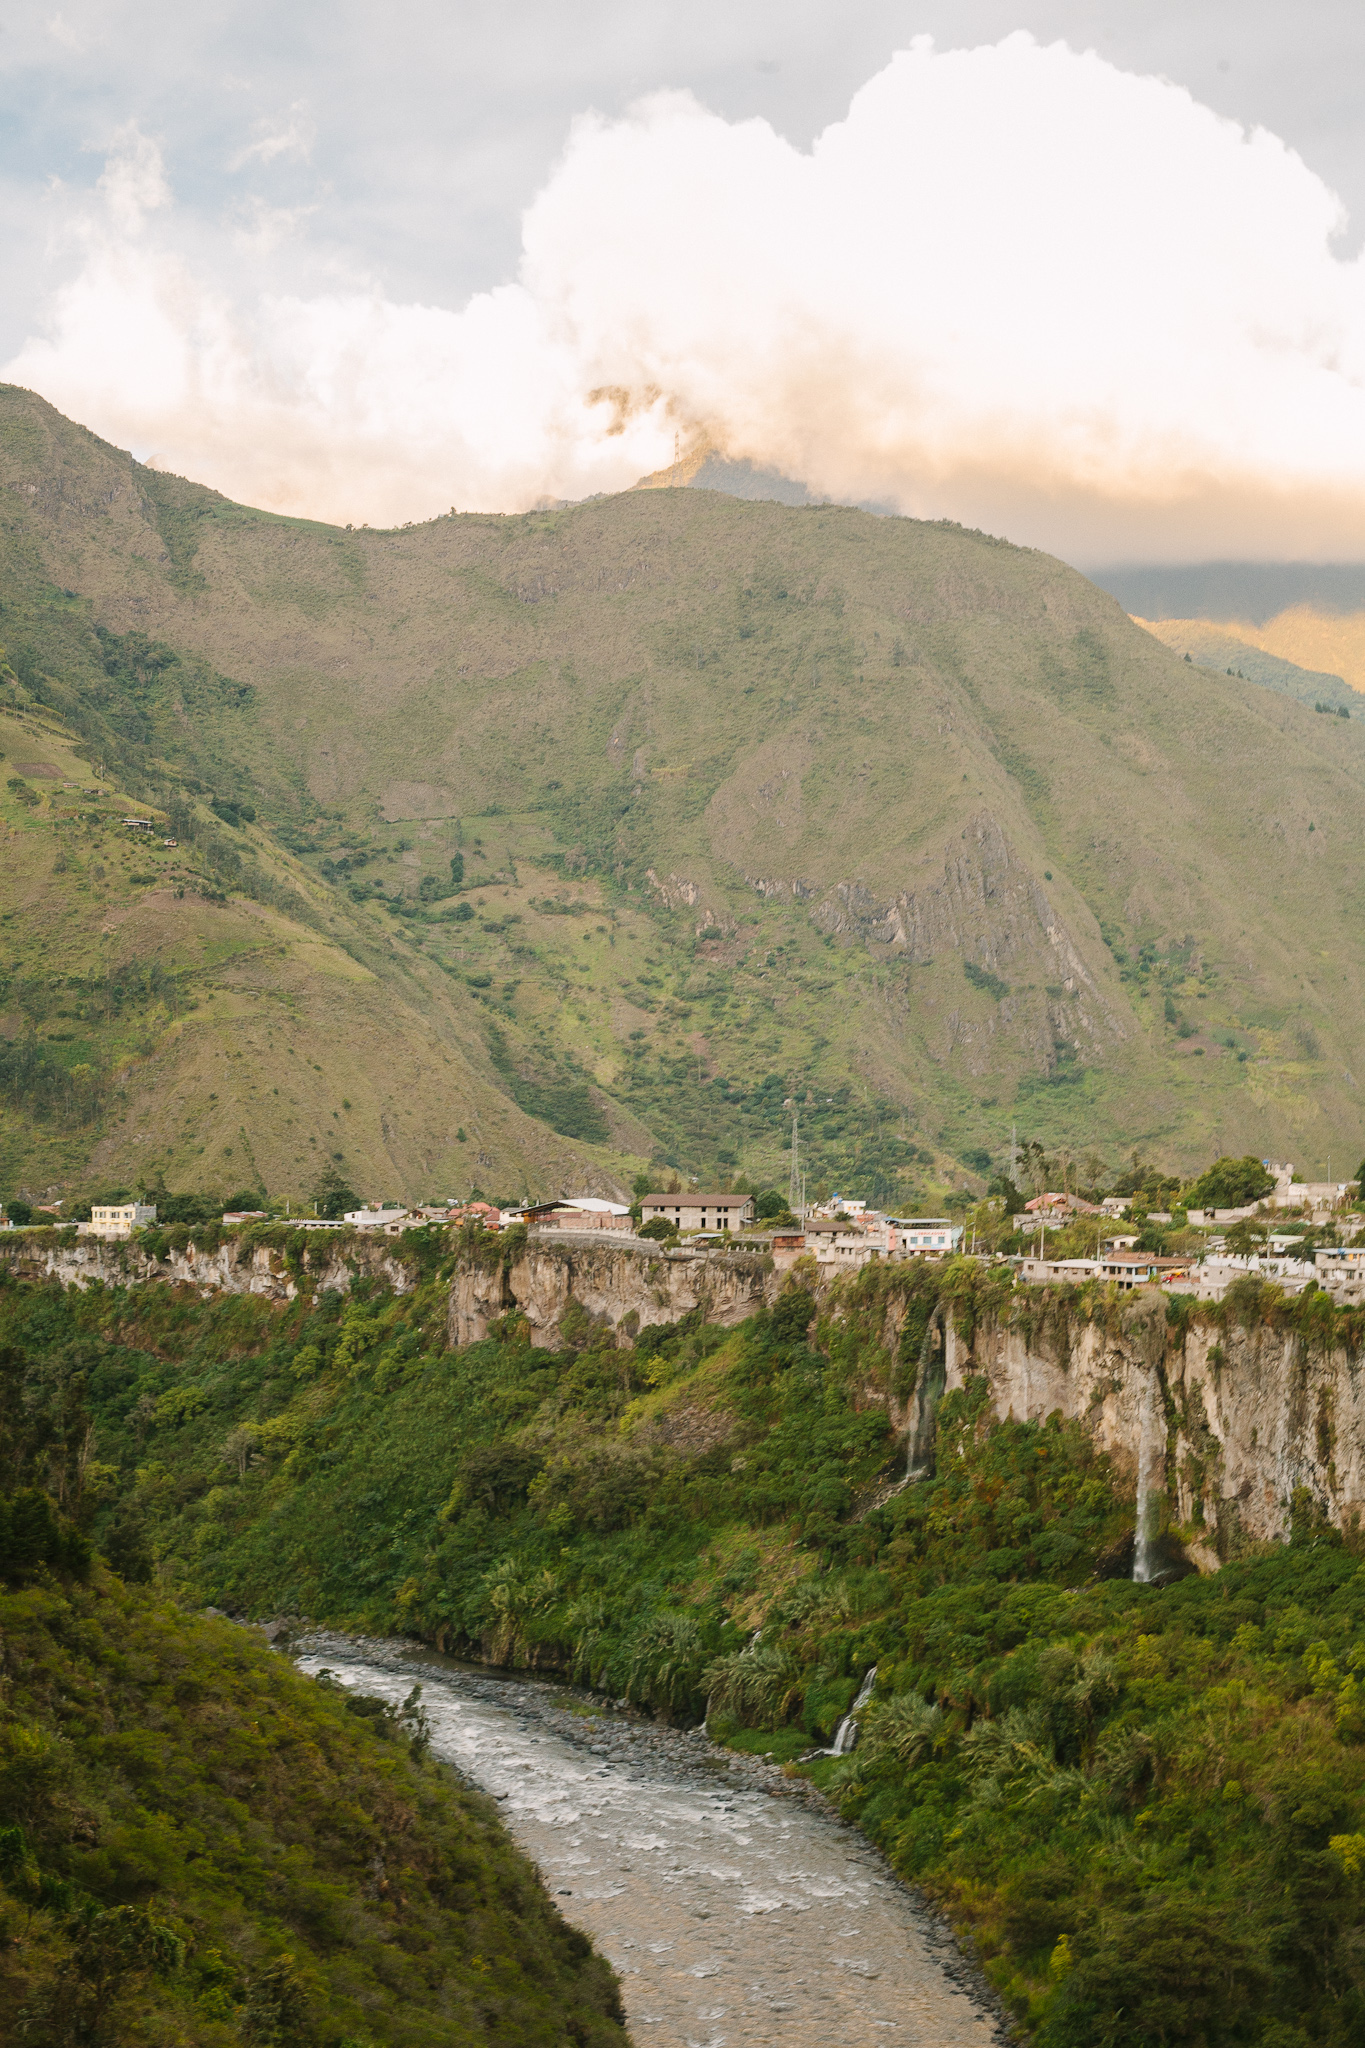 Ecuador2011_Mountains&Sea_Web_jenniferleahy-008.jpg